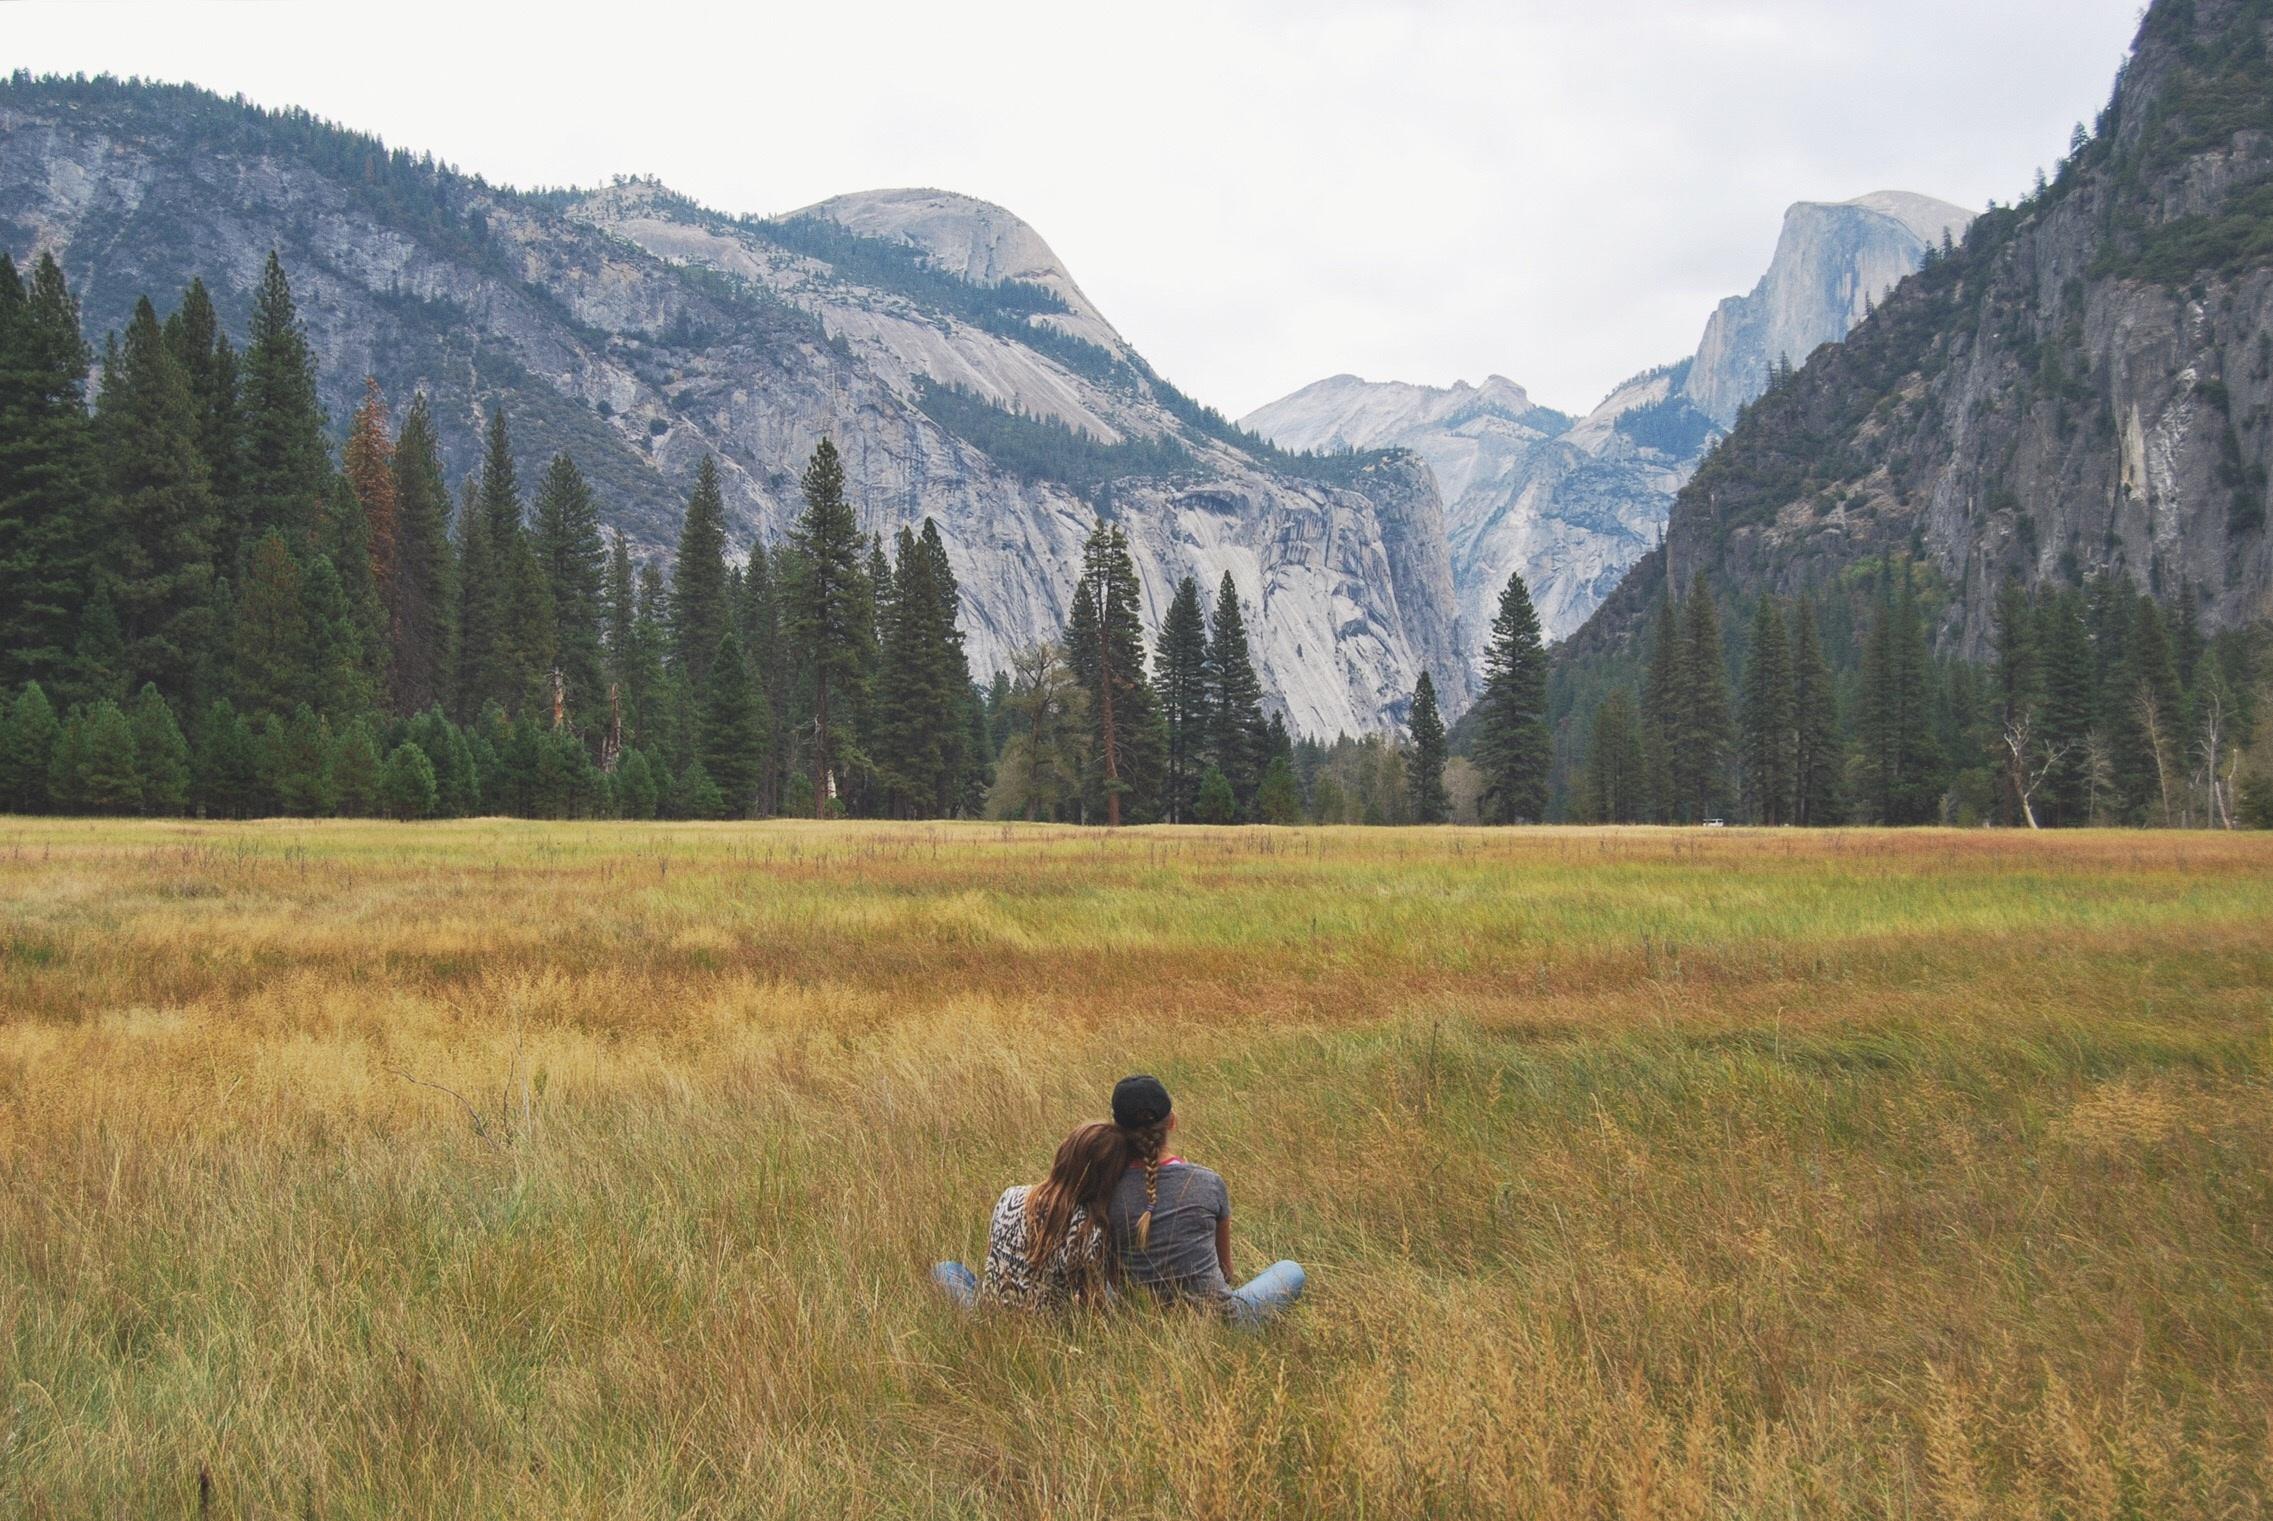 Photo of Yosemite National Park via Unsplash